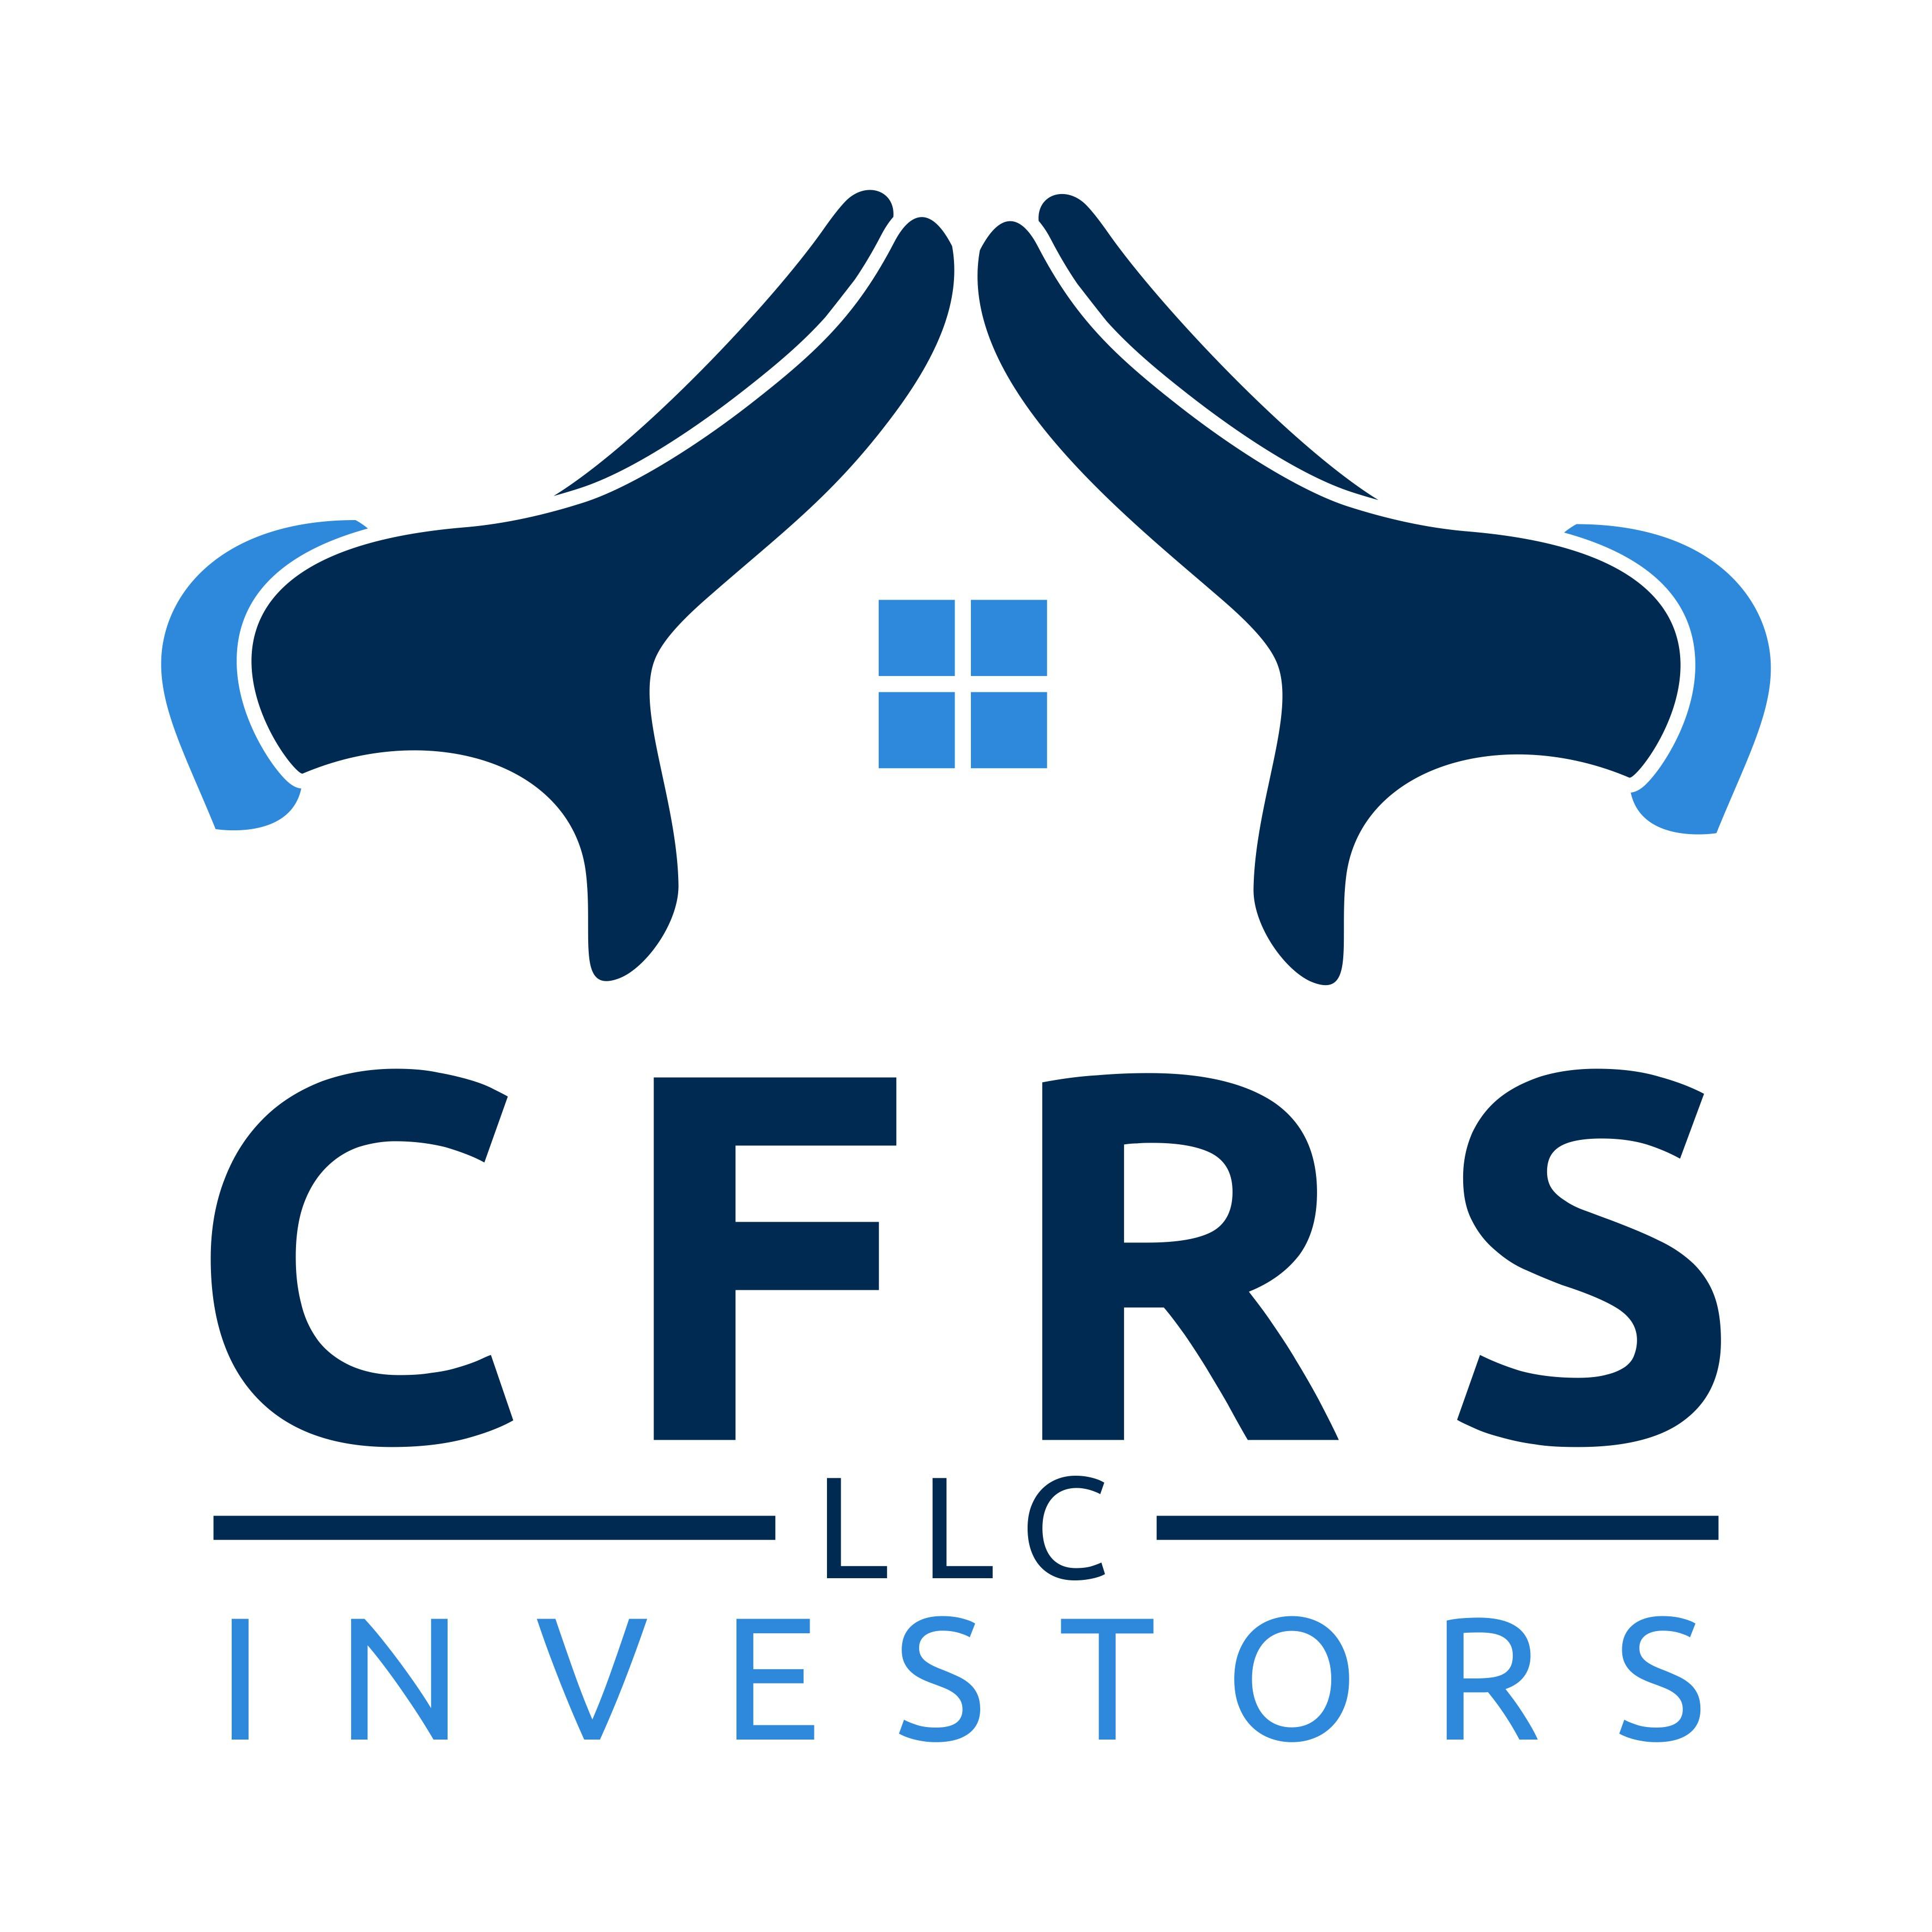 real estate investors rehabbing homes and neighborhoods